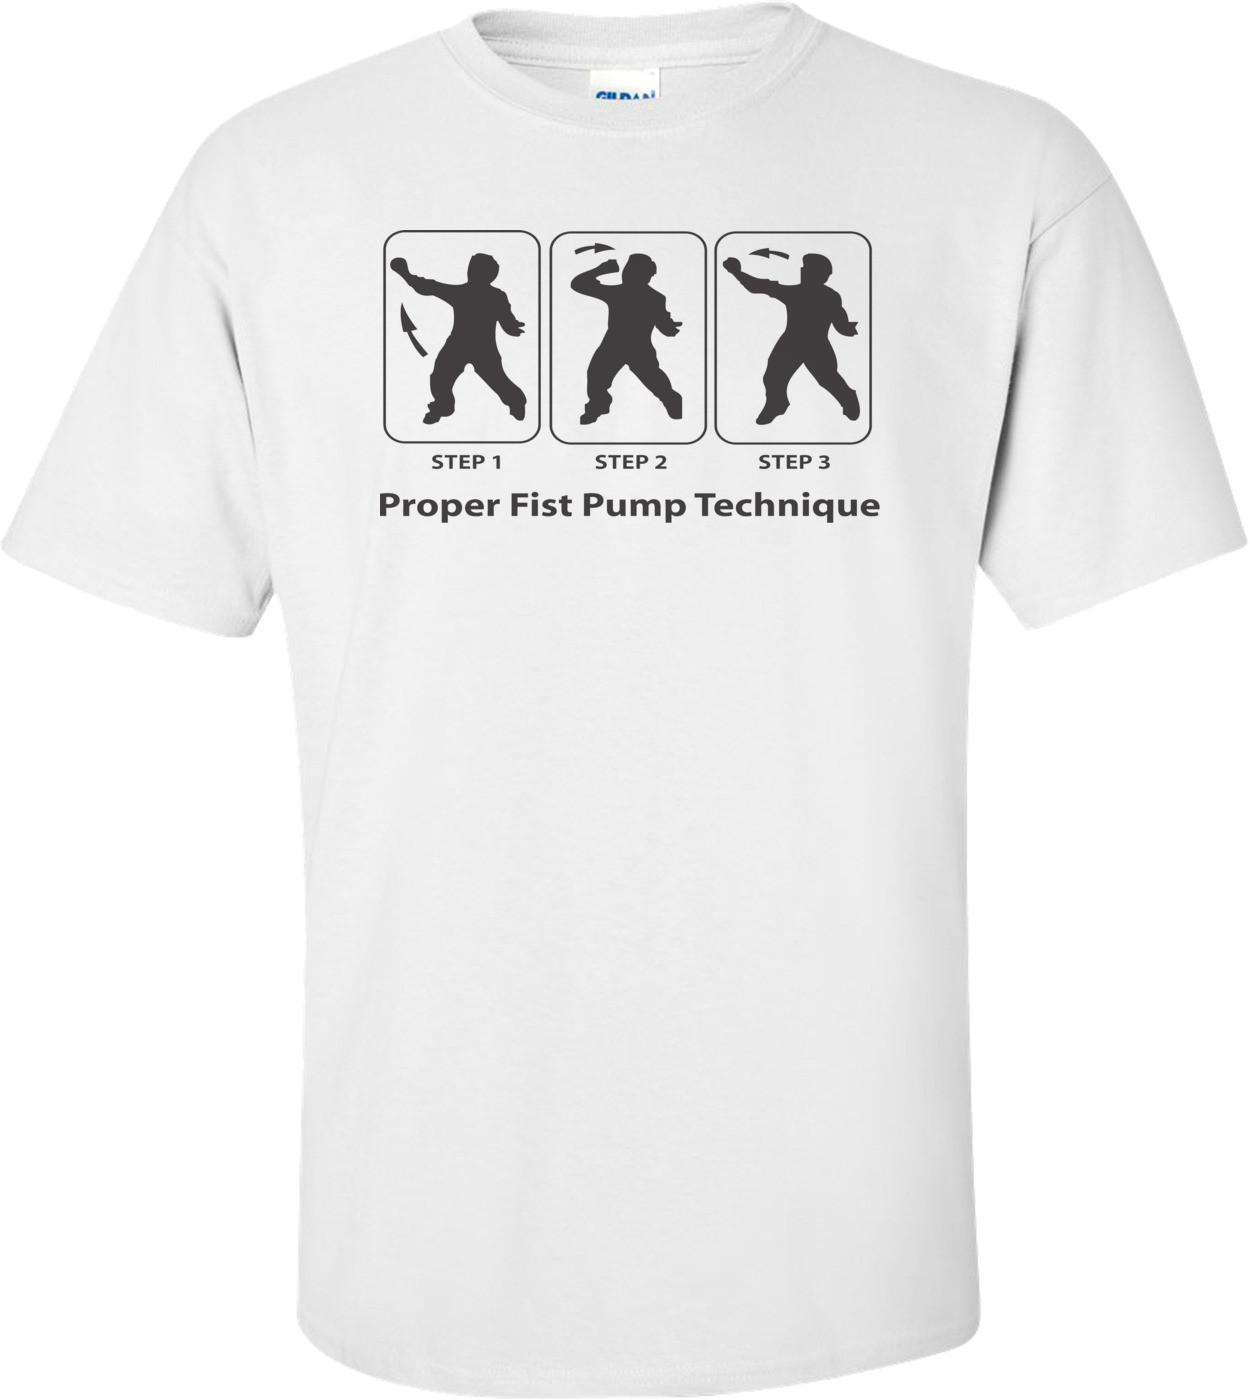 Fist Pumping Technique- Jersey Shore T-shirt